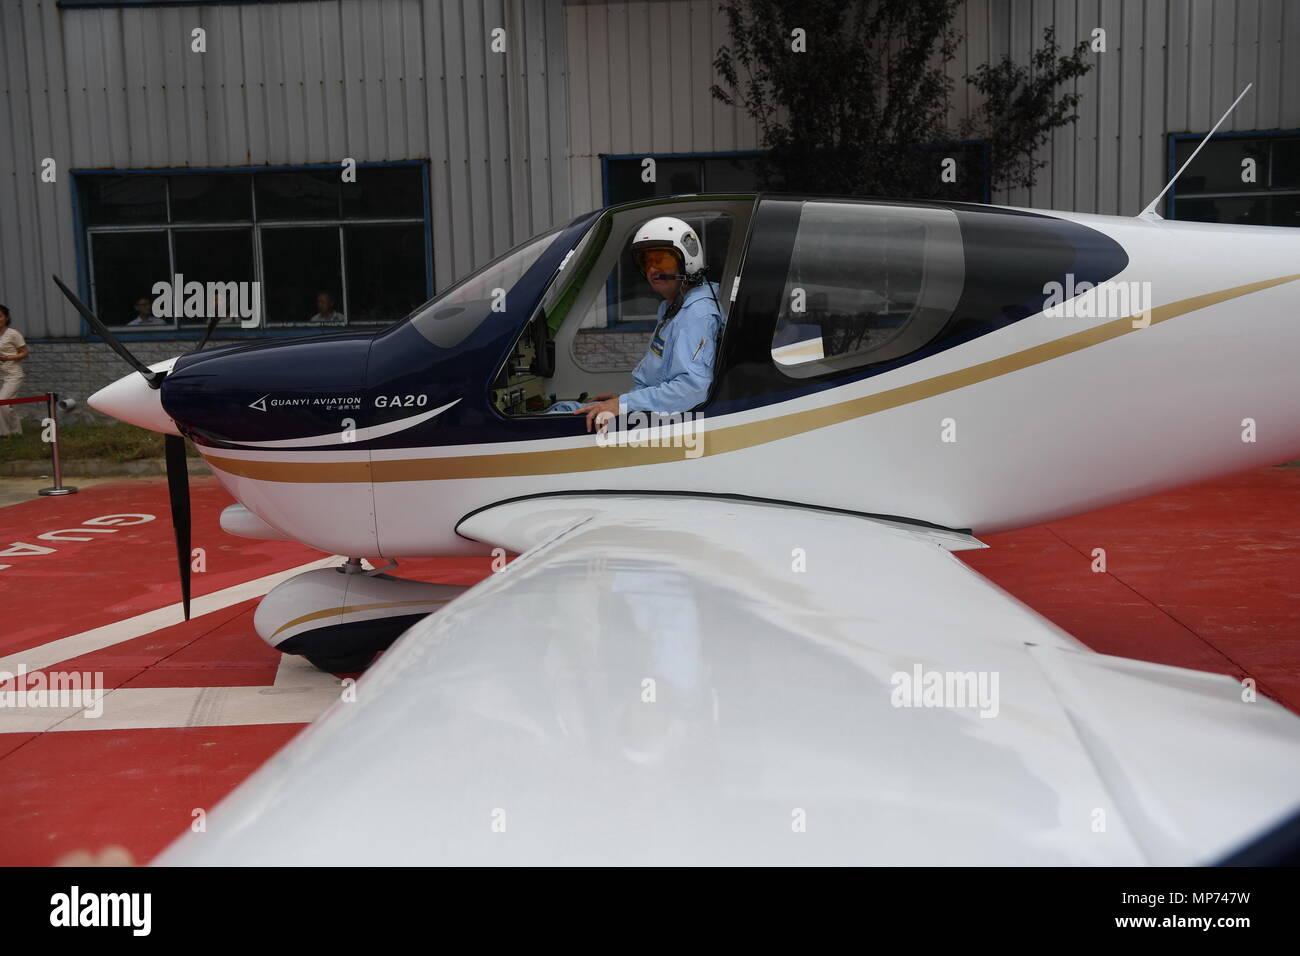 Nanchang Chinas Jiangxi Province 21st May 2018 A Pilot Gets Off An